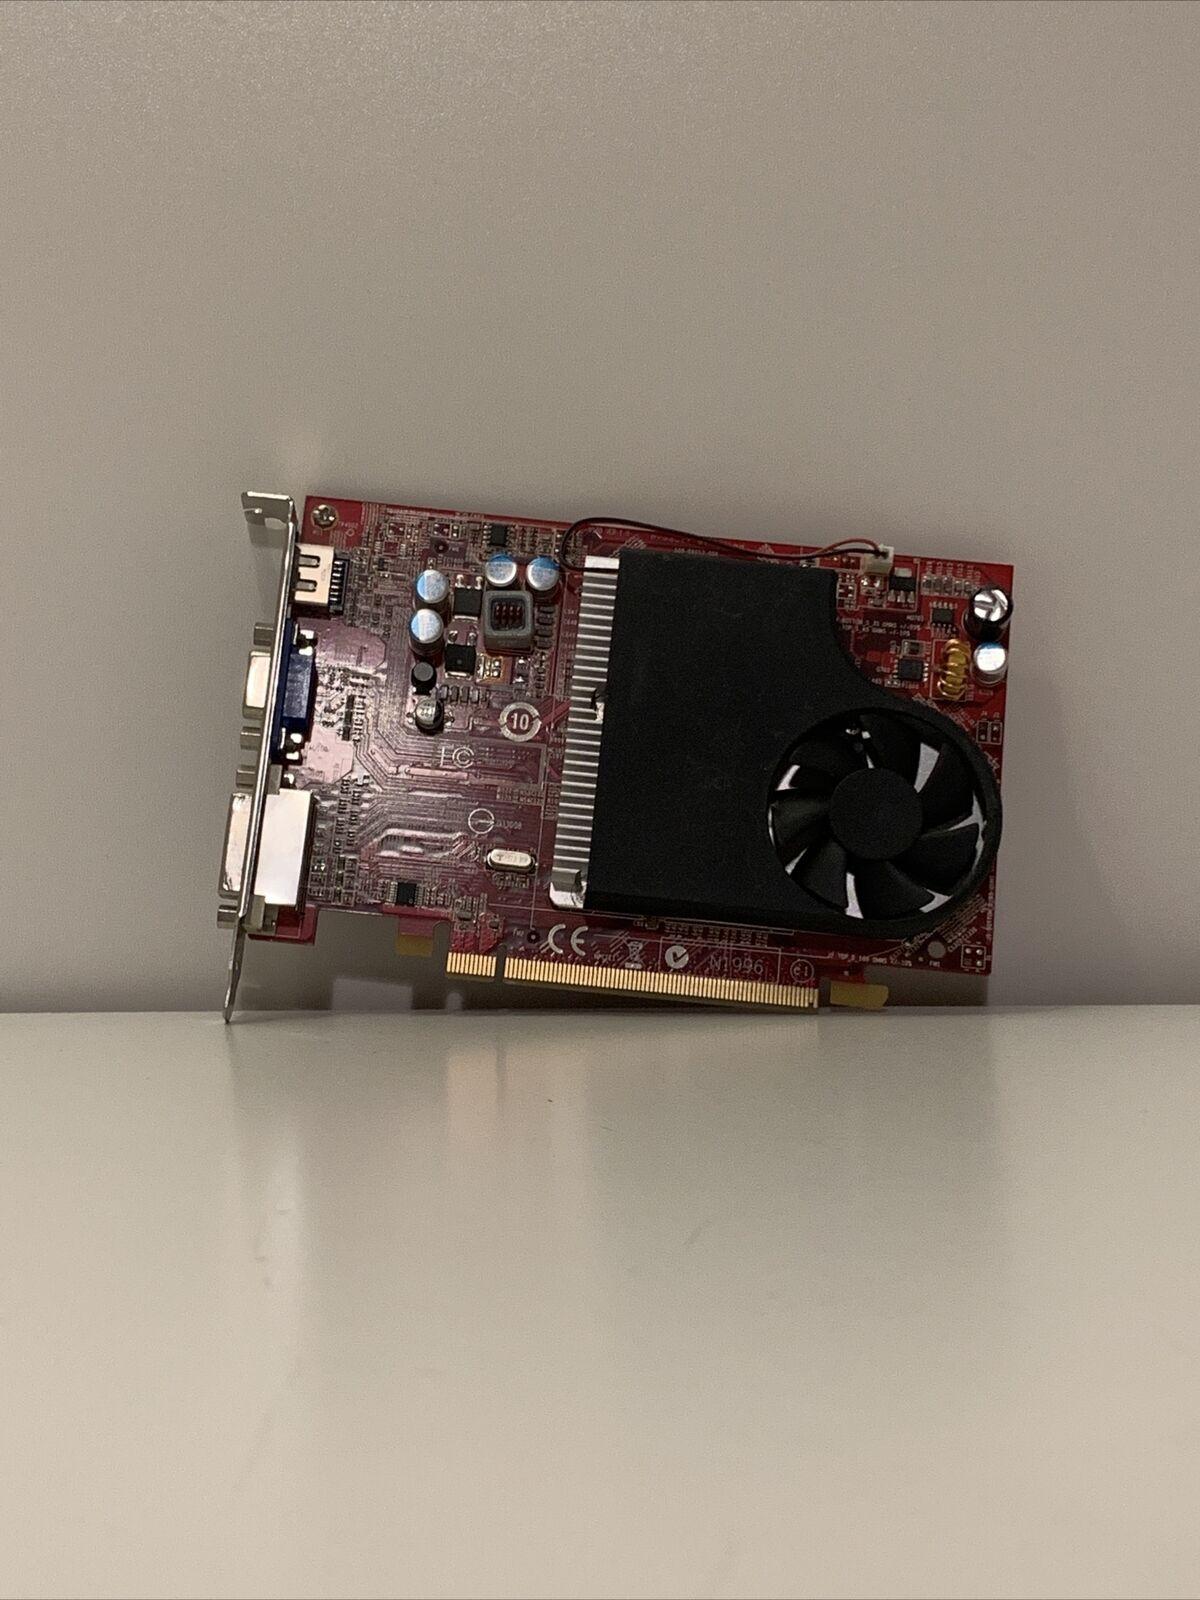 578174-001 FOR HP AMD Radeon HD 4650 1GB Delphinus 2 Ddr2 Video Card 533166-001